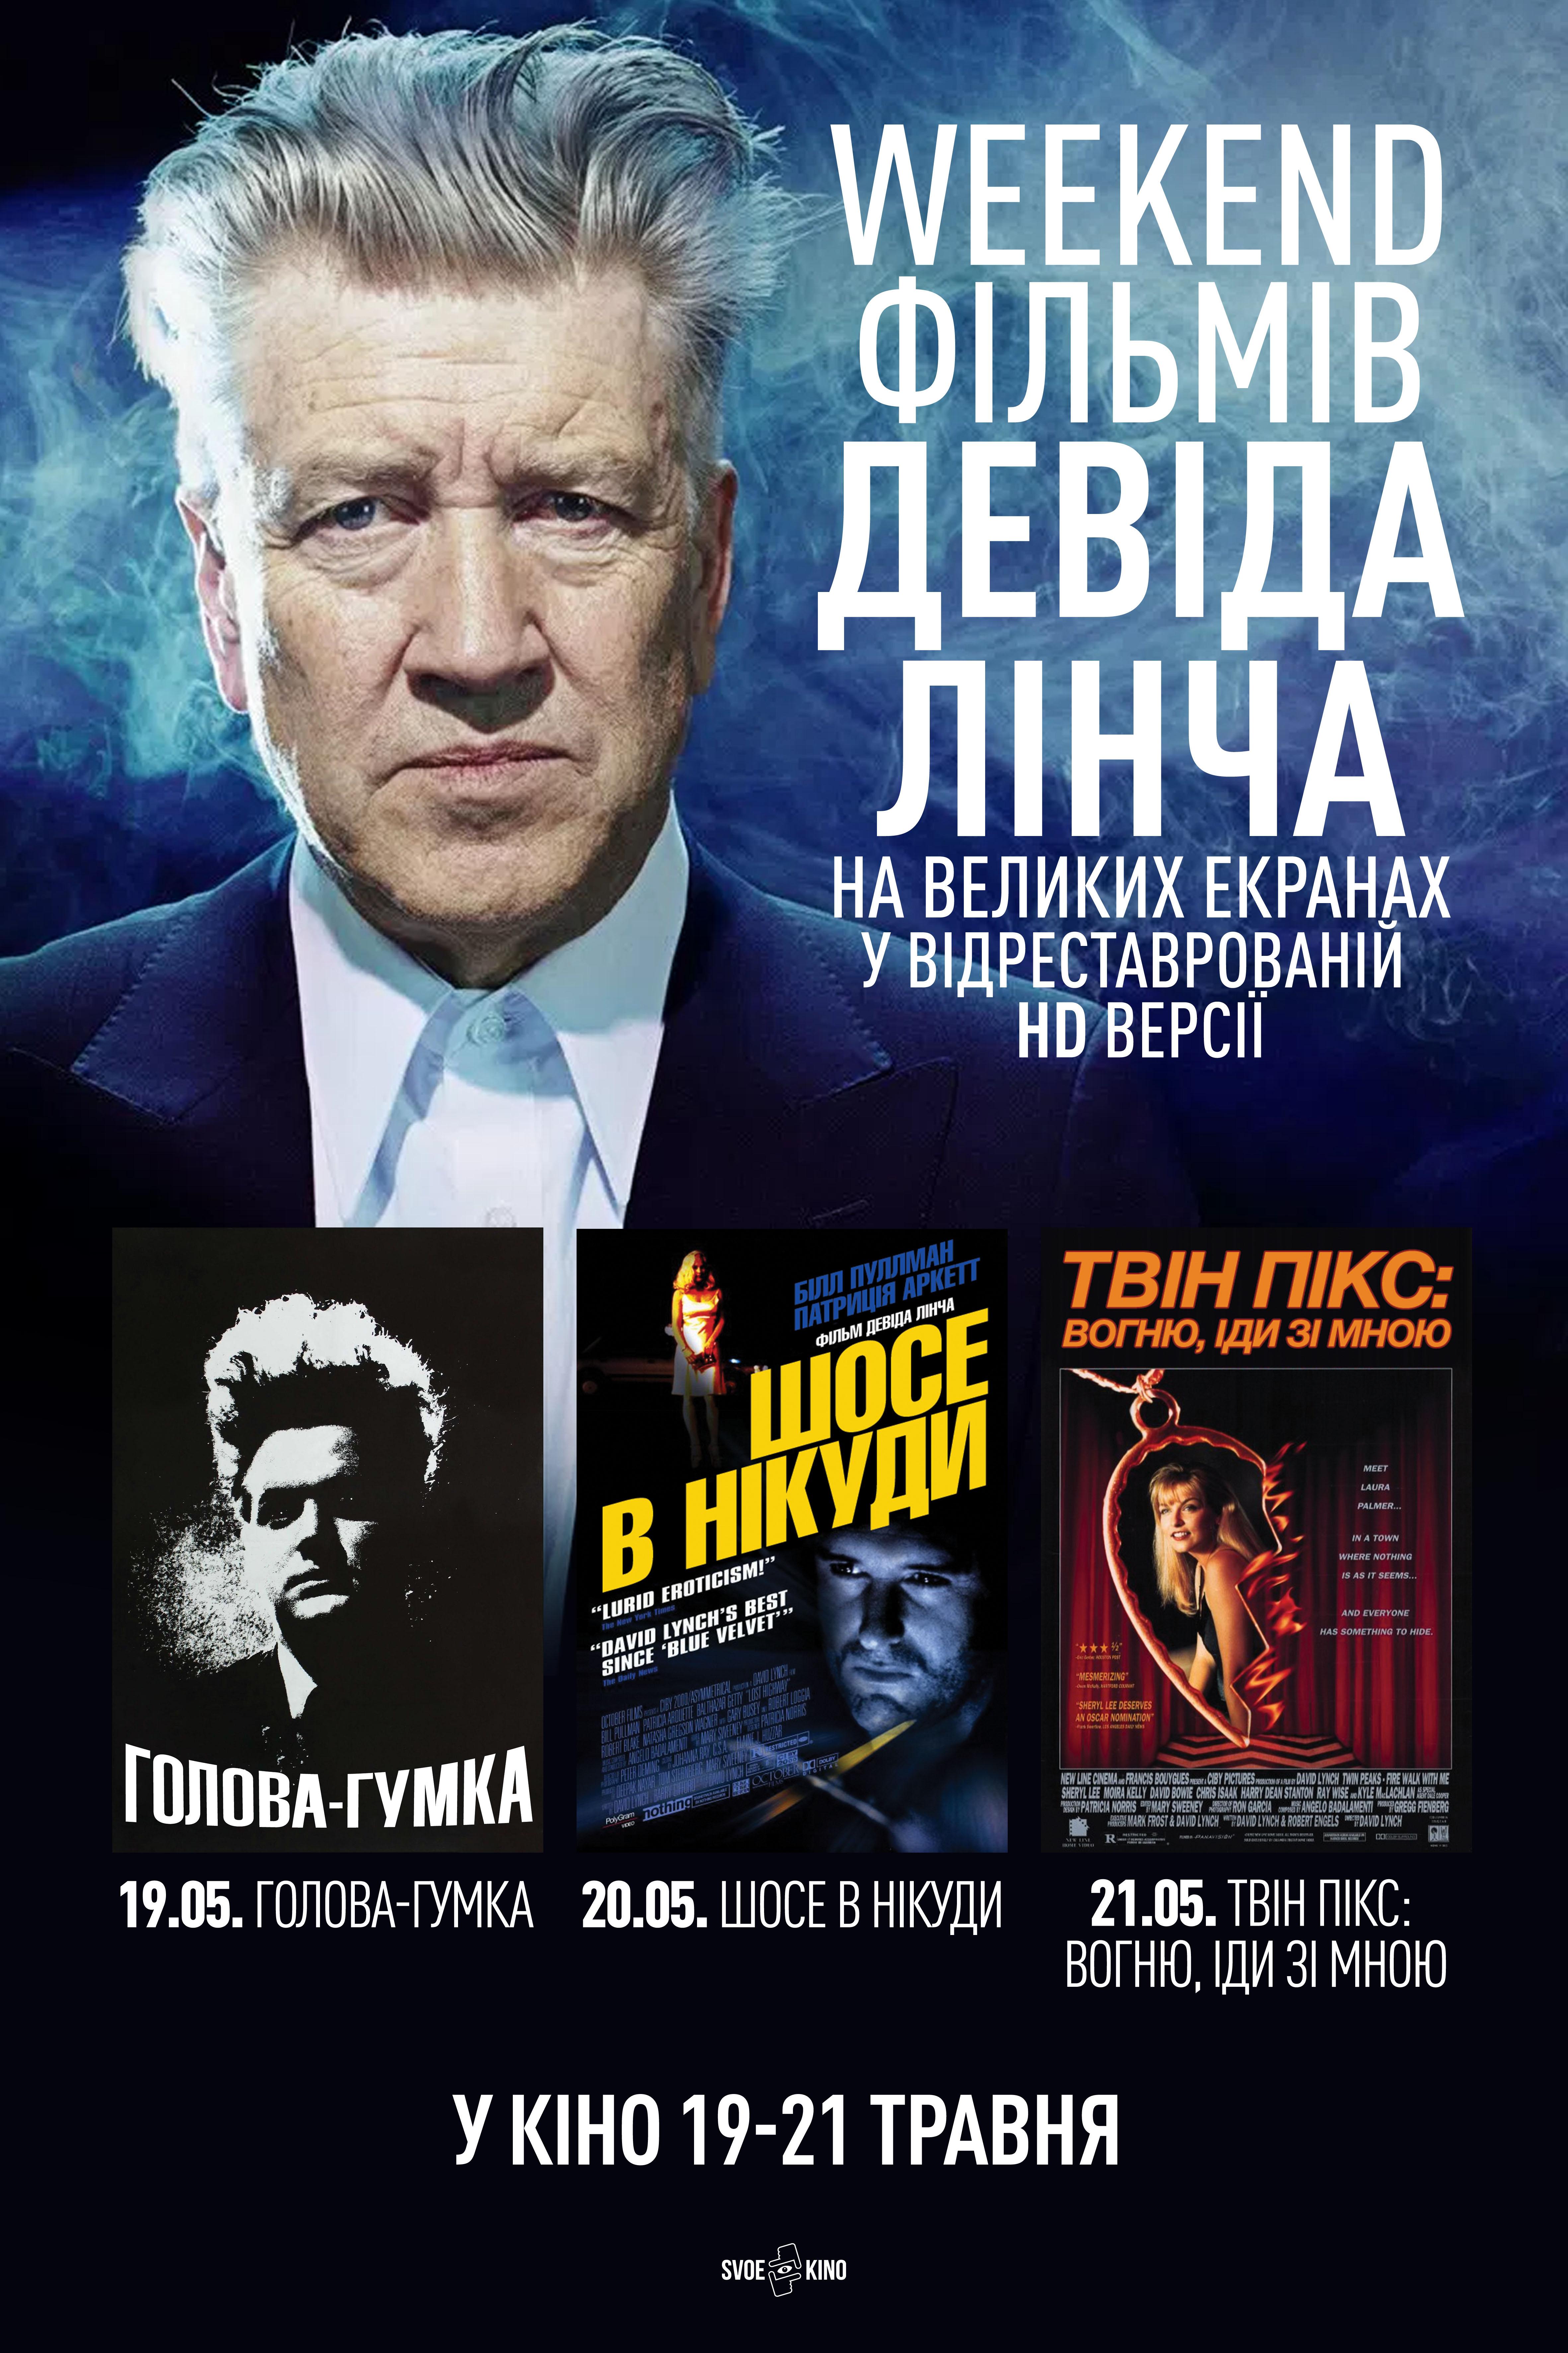 Ретроспектива Дэвида Линча